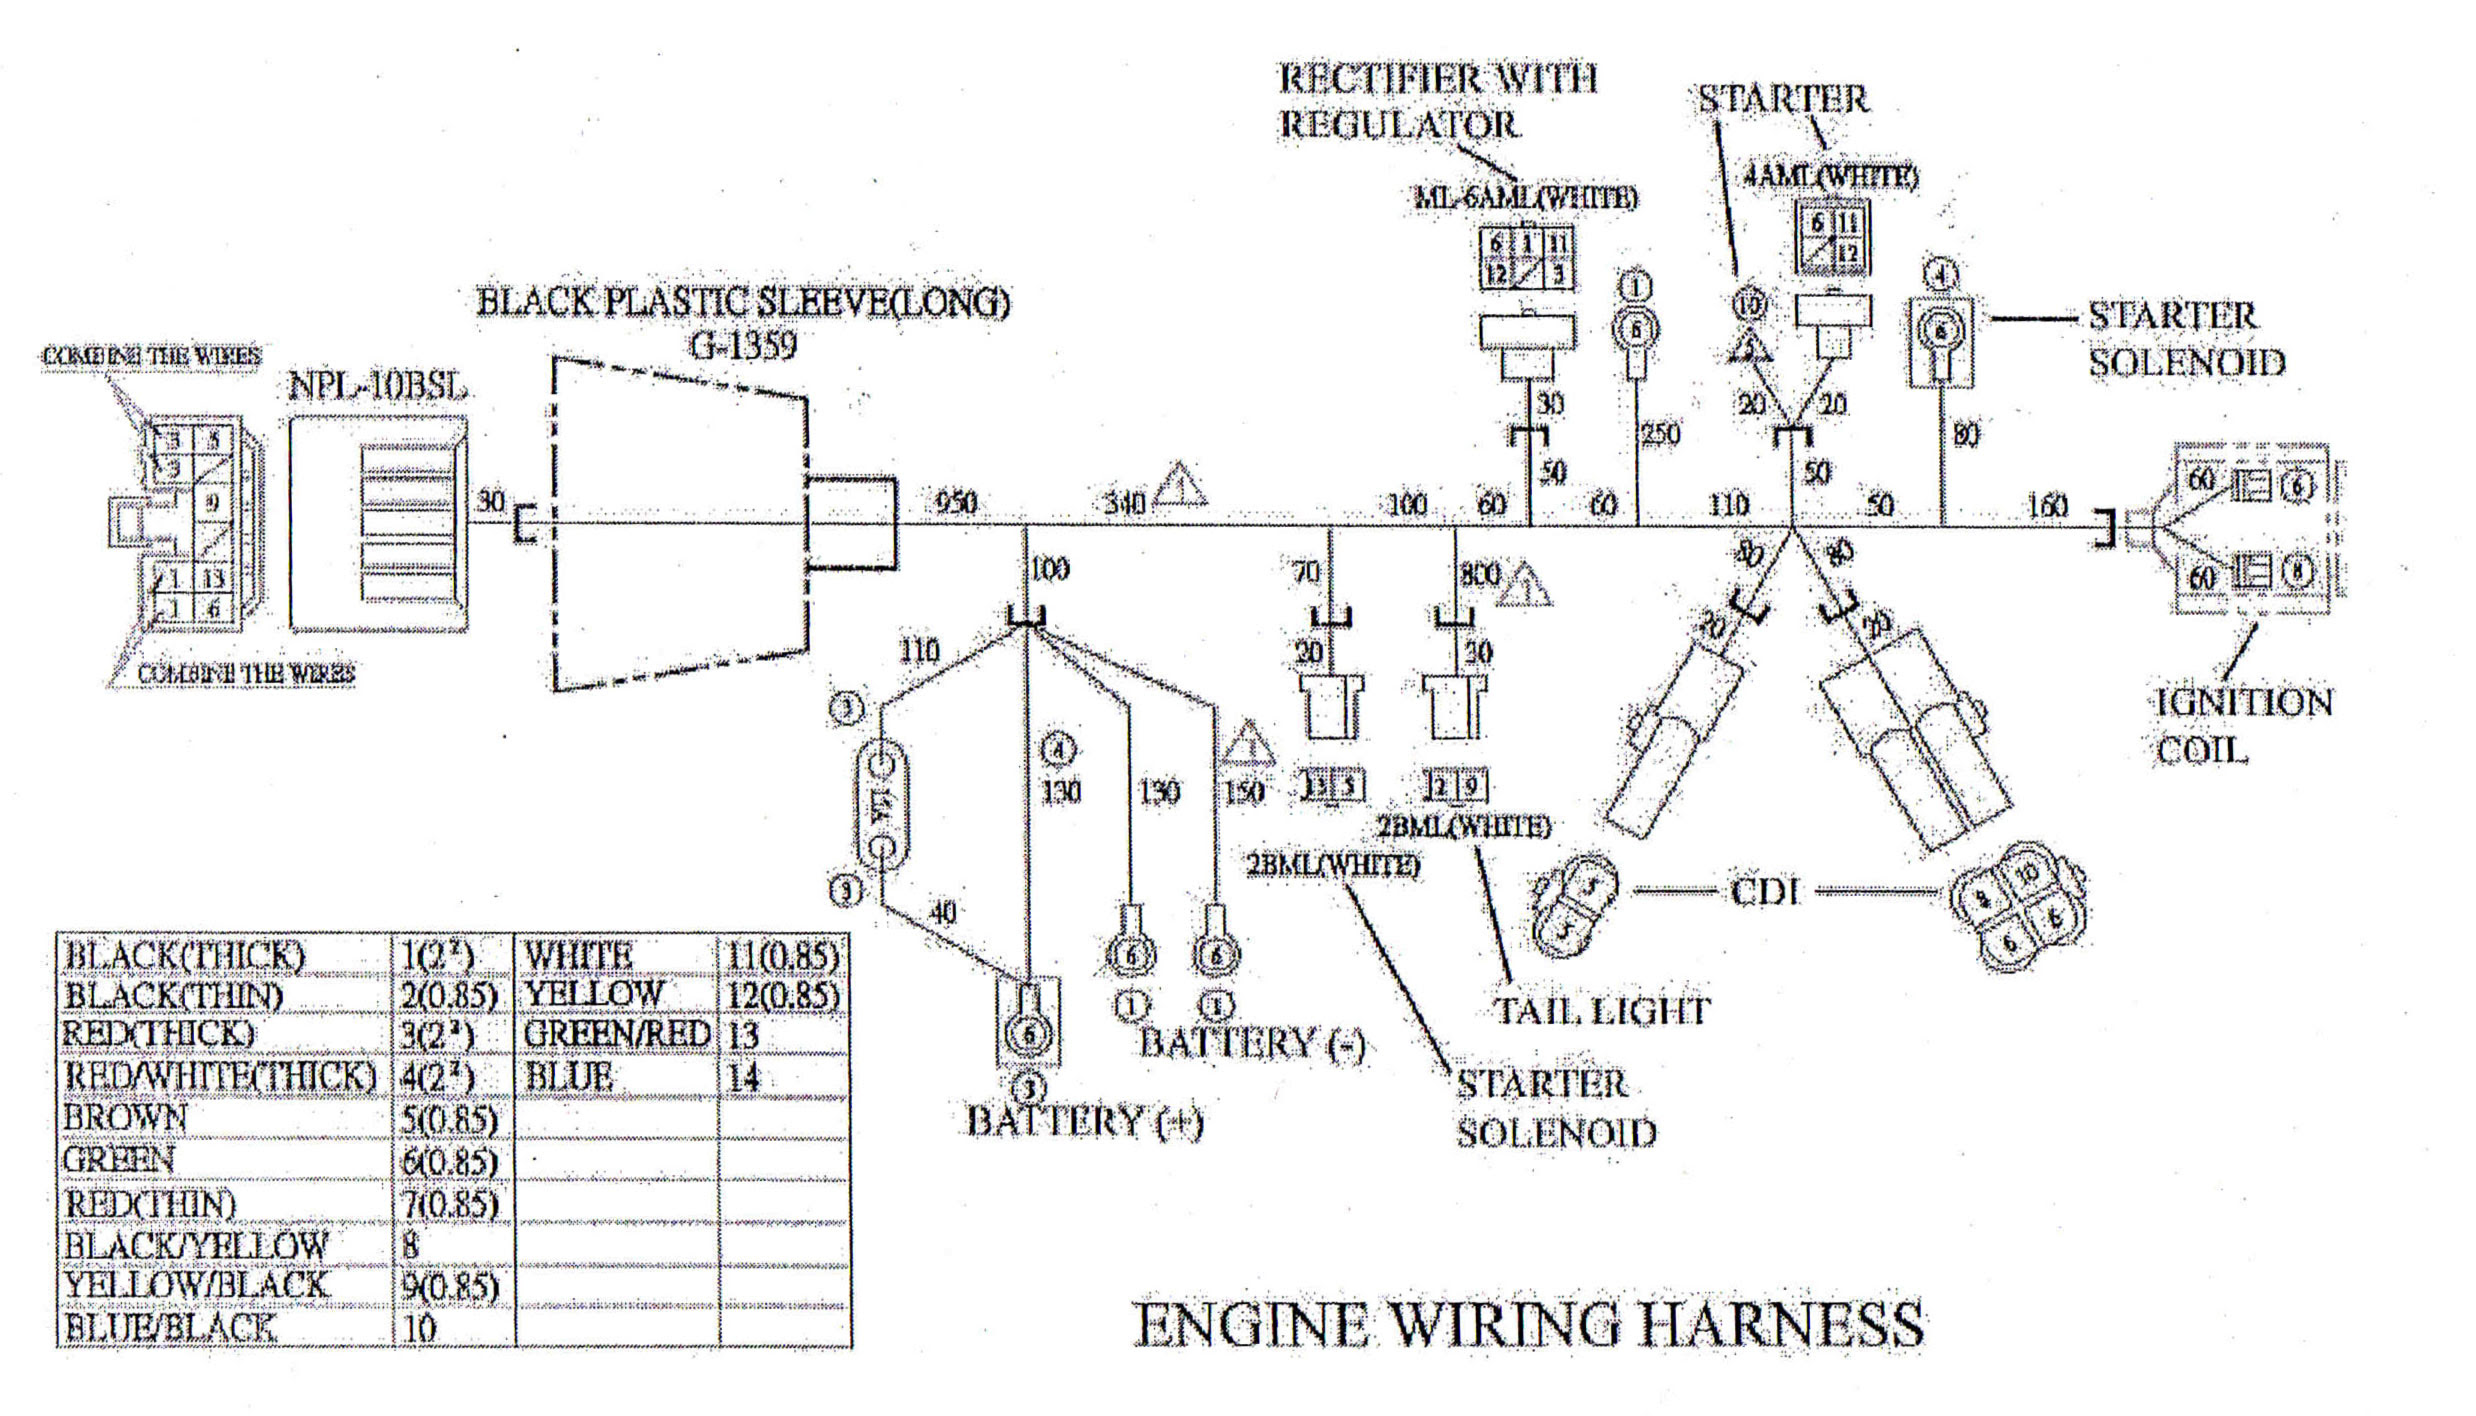 Baja Dune 150 Wiring Diagram Free Picture - Fusebox and Wiring Diagram  electrical-die - electrical-die.sirtarghe.itdiagram database - sirtarghe.it